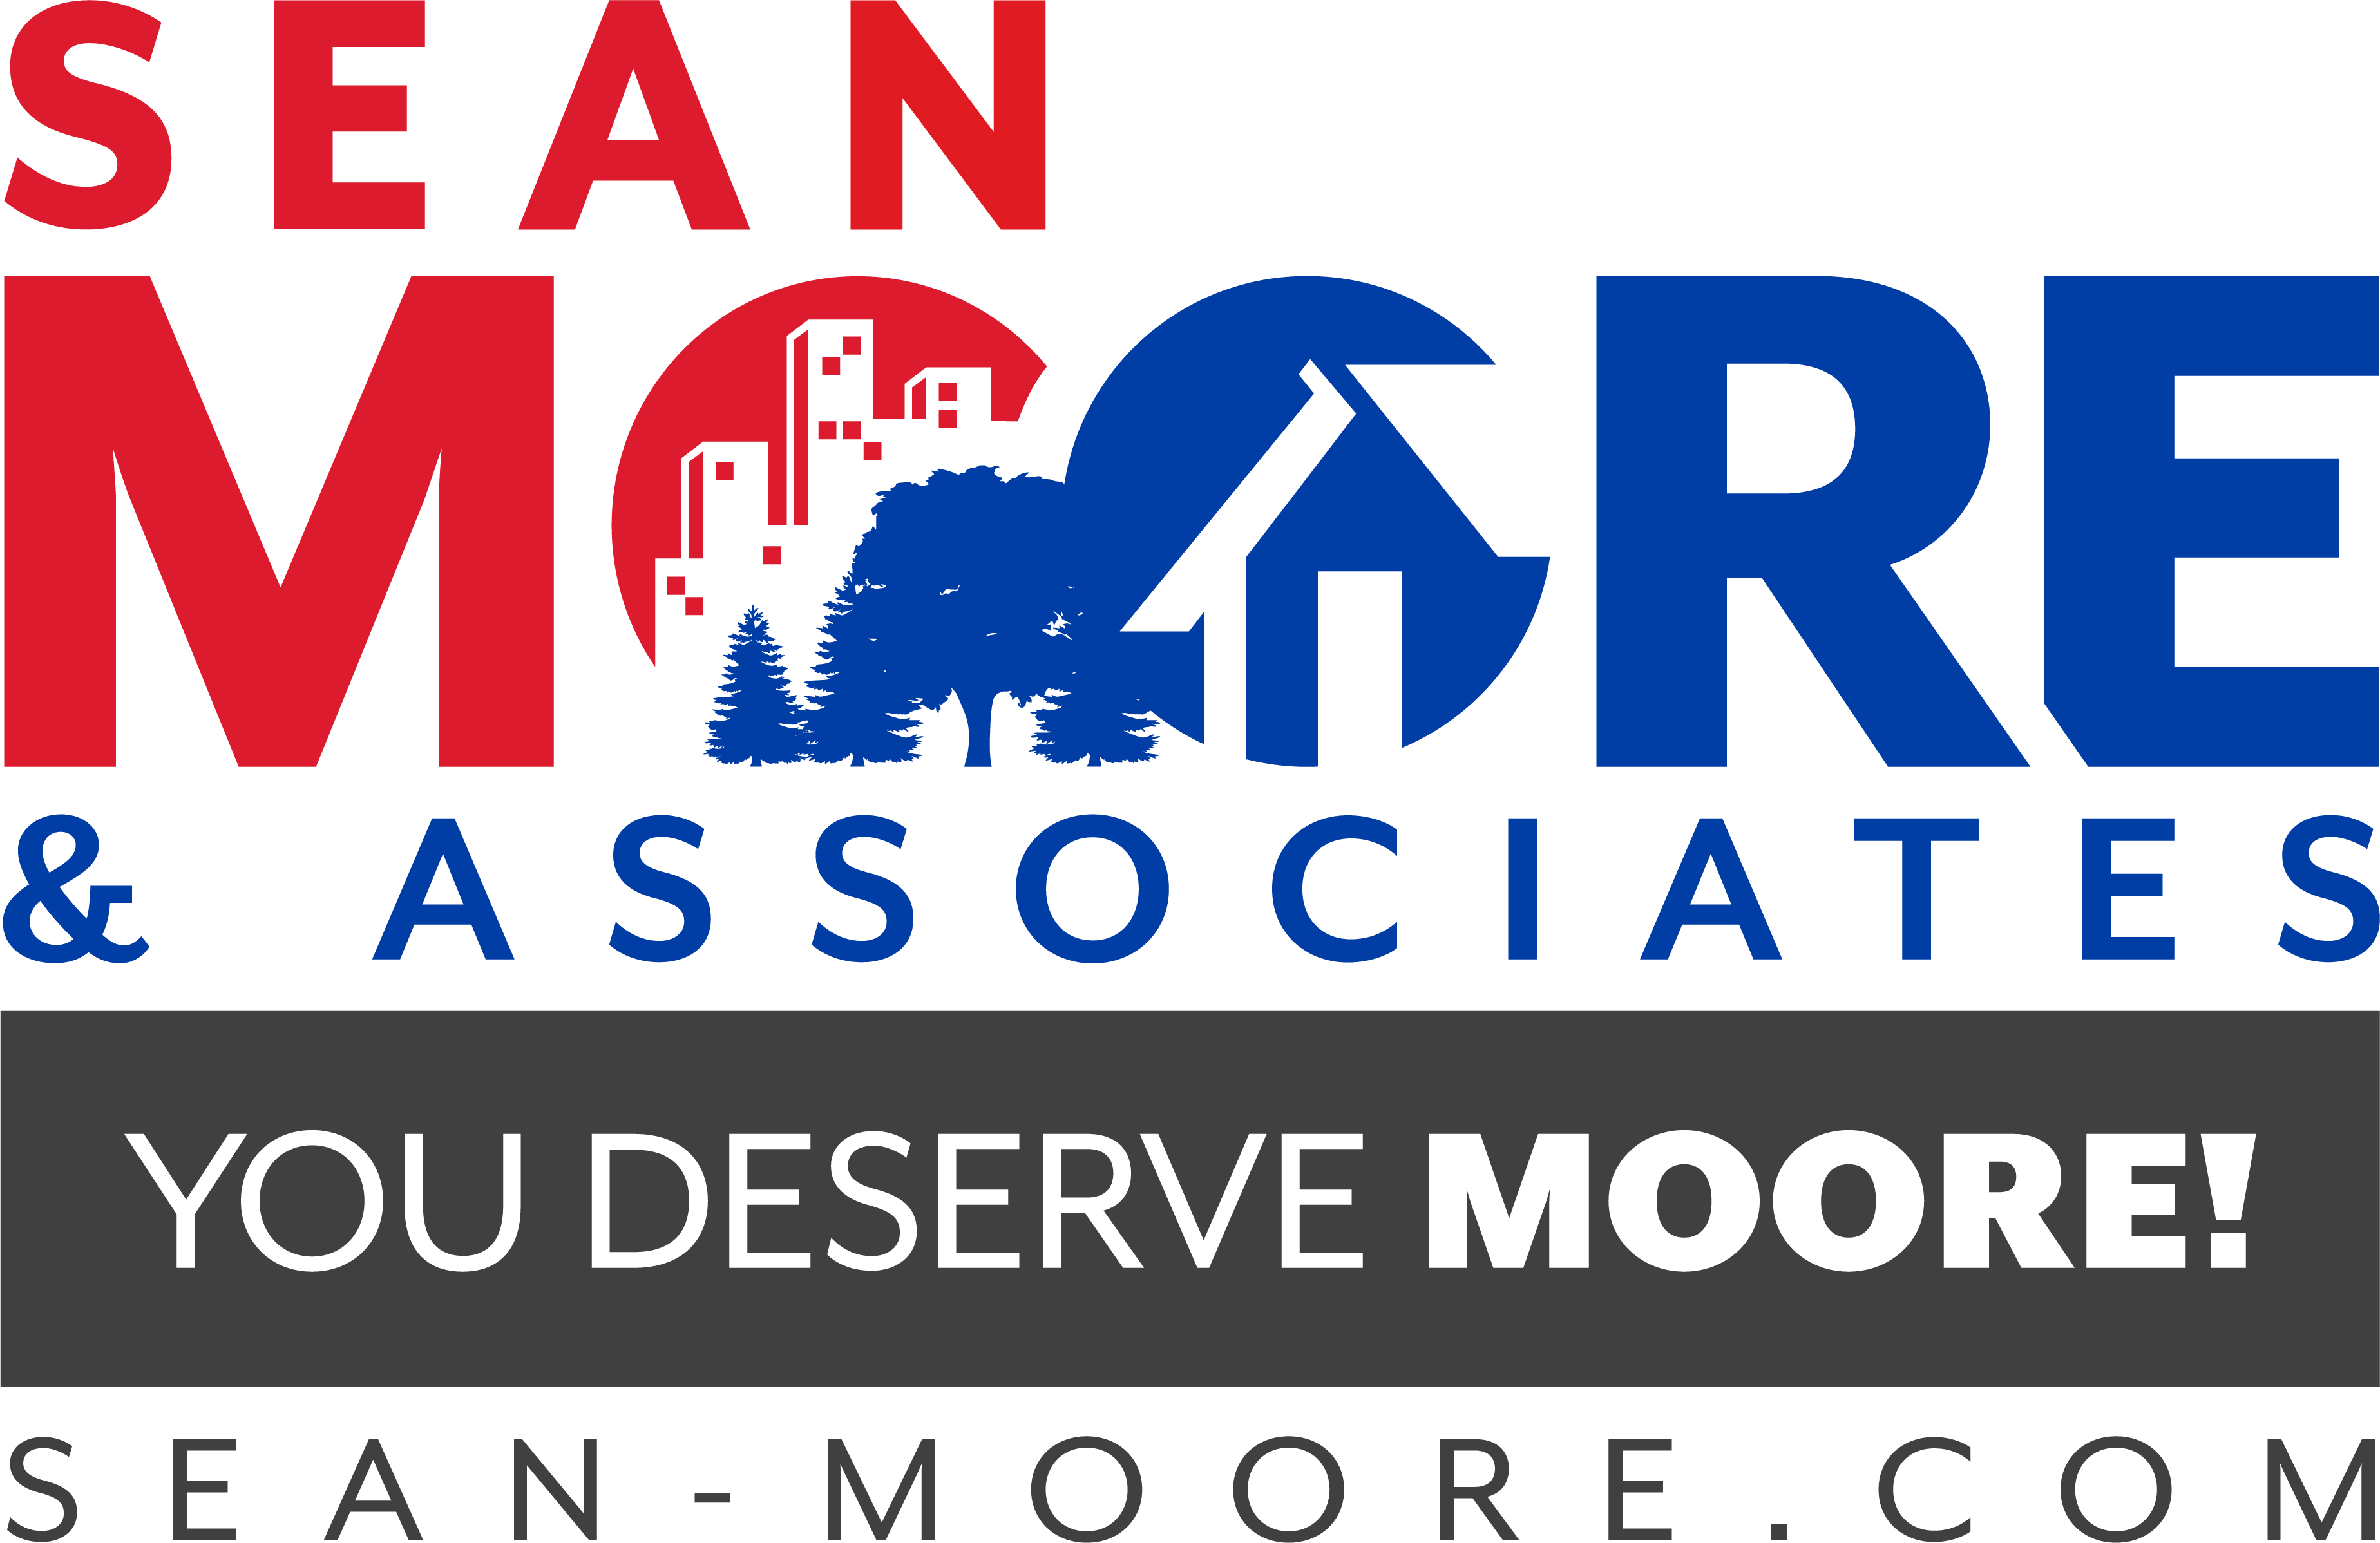 Sean Moore & Associates